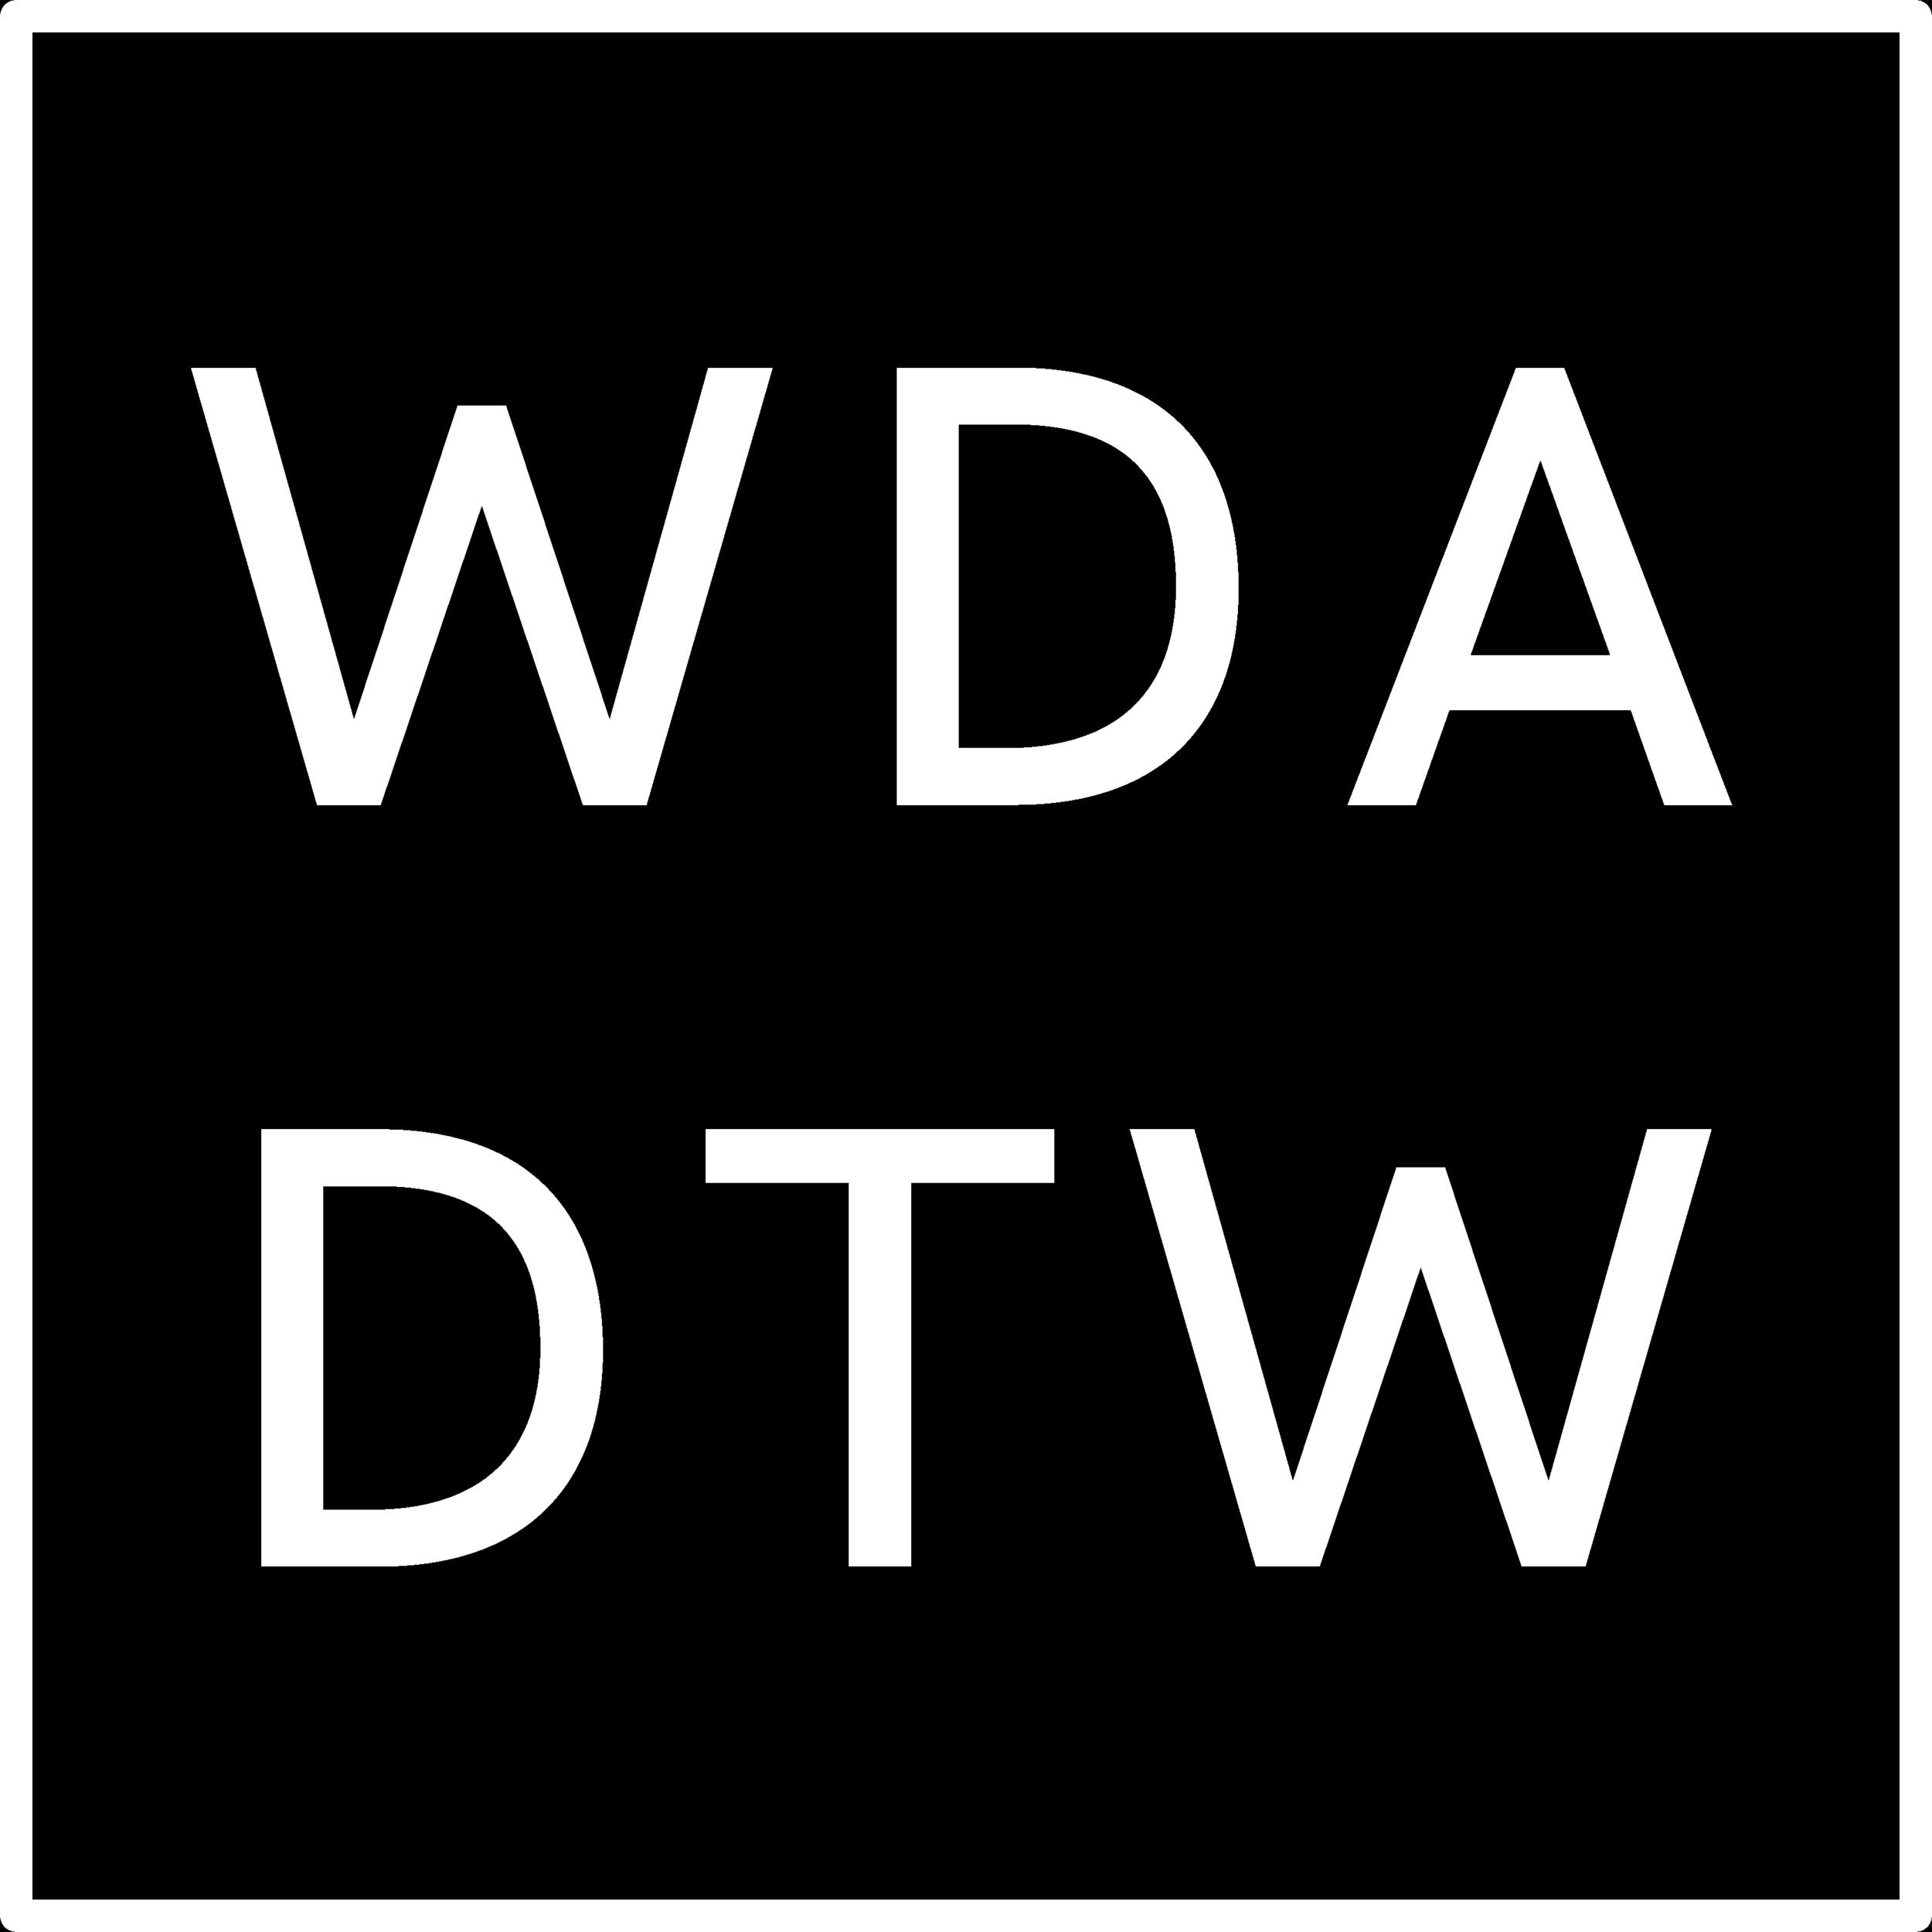 WADTW_Logo_black 800x800.png